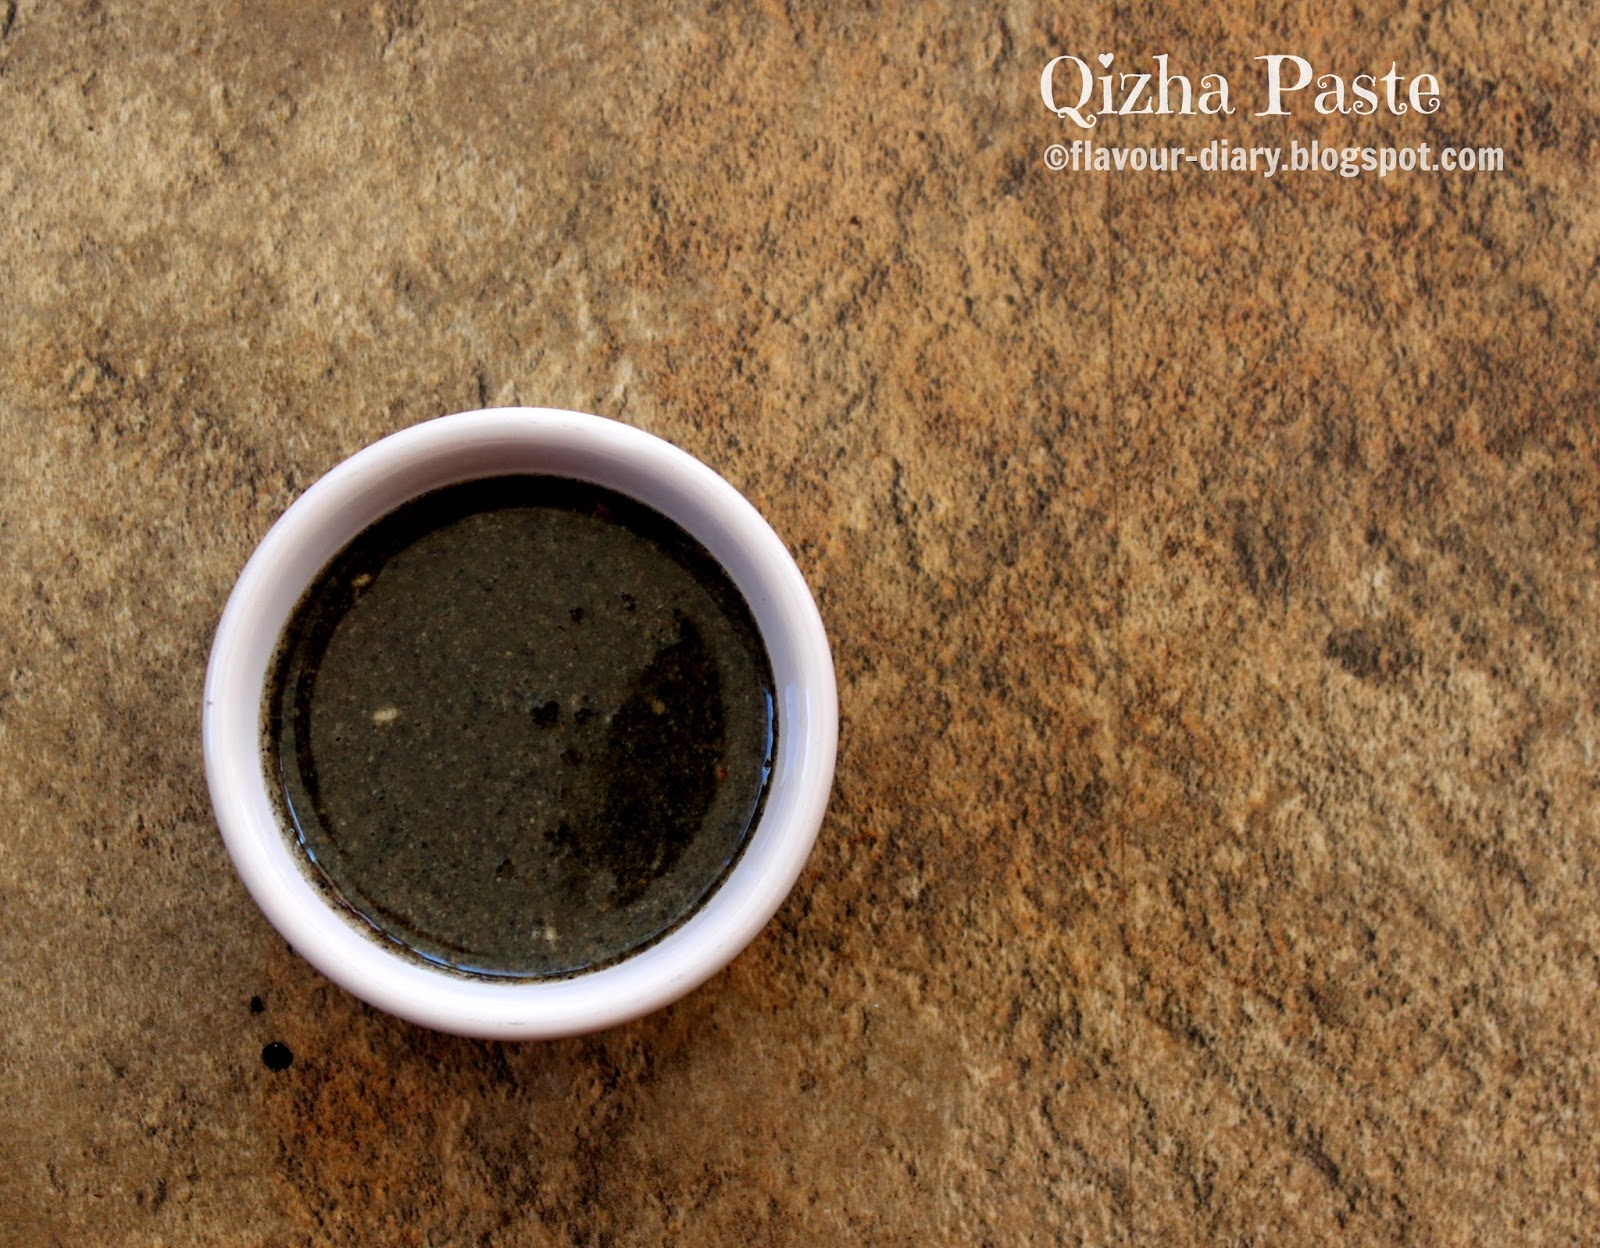 qizha paste black seed paste